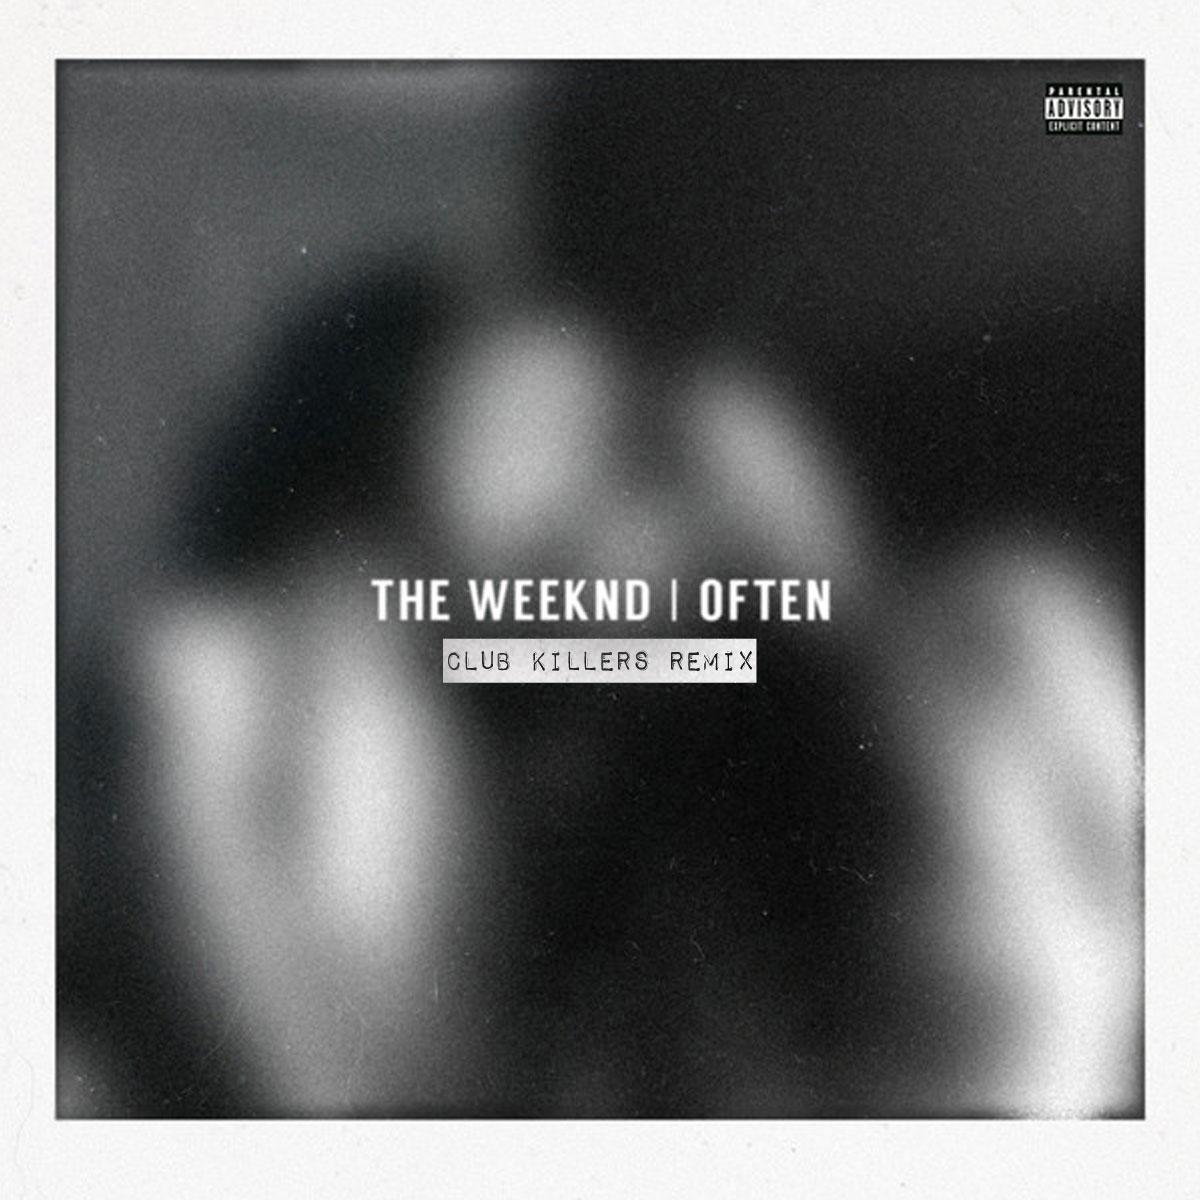 The-Weeknd-Often-Club-Killers-Remix-ARTWORK.jpg